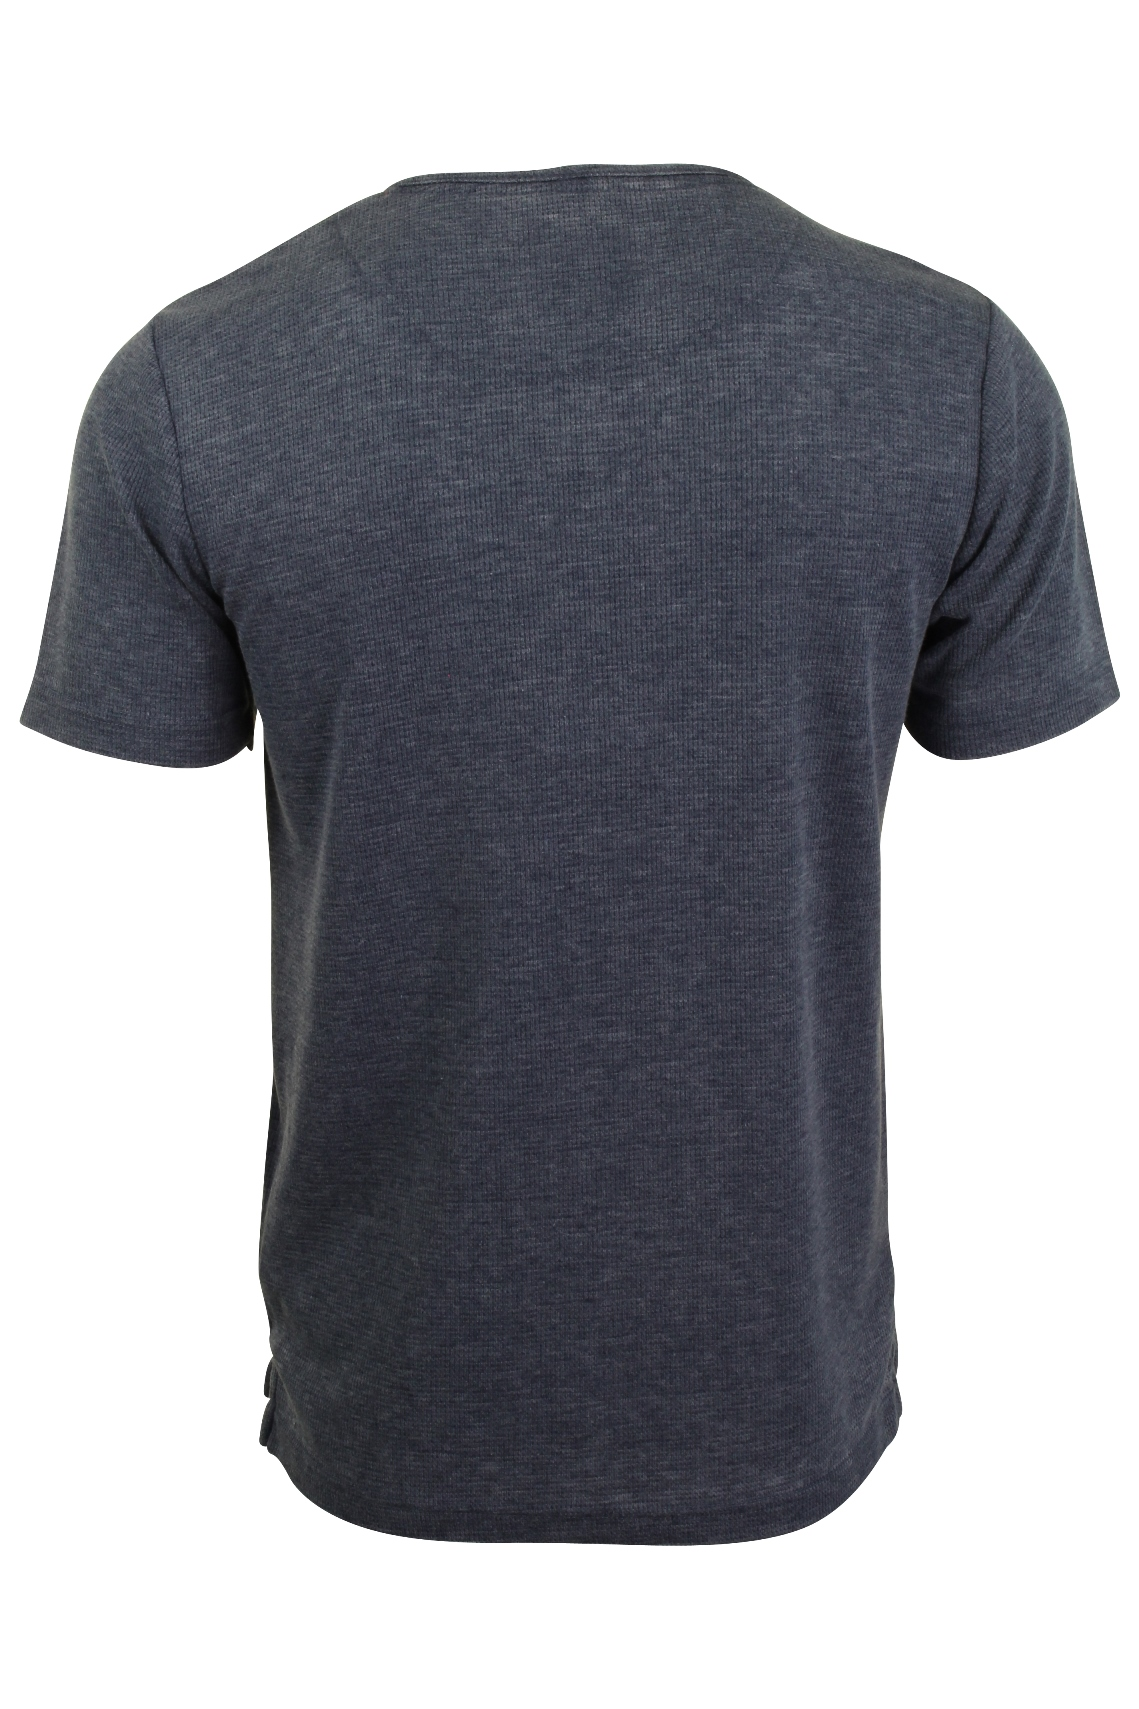 Mens-Tokyo-Laundry-Grandad-T-Shirt-Waffle-Burn-Out-Fabric thumbnail 8